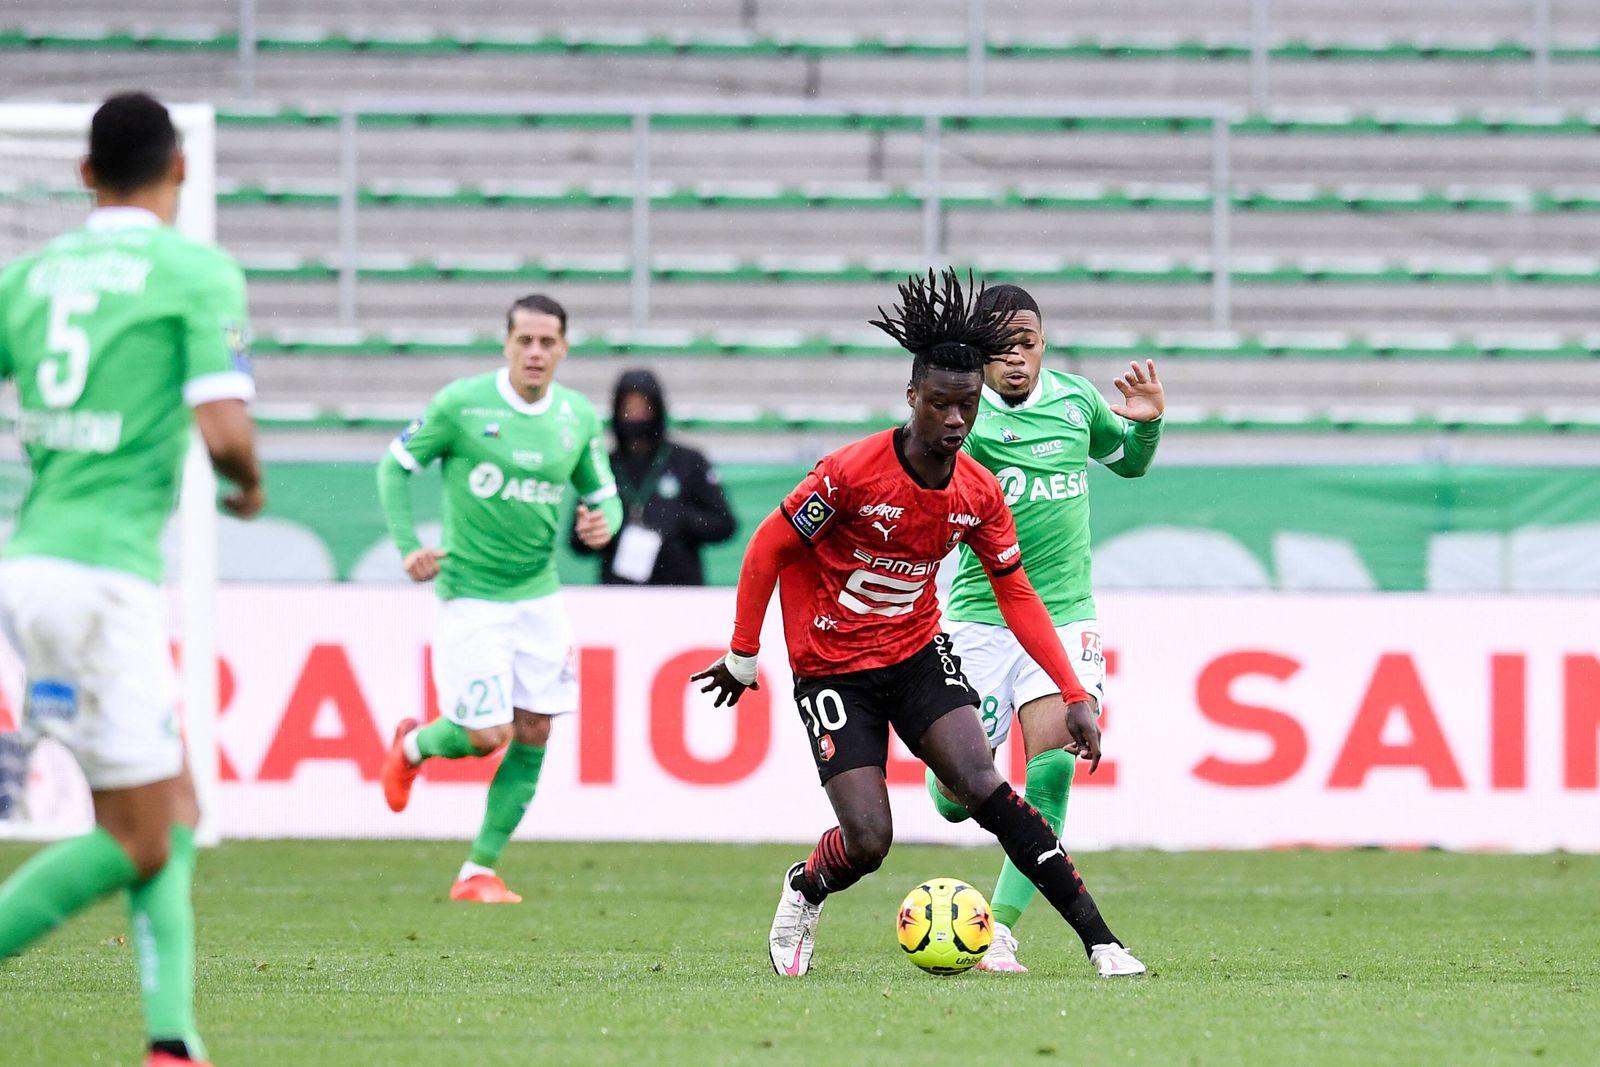 10 EDUARDO CAMAVINGA (REN) FOOTBALL : Saint Etienne vs Rennes - Ligue 1 Uber Eats - 26/09/2020 FEP/Panoramic PUBLICATION